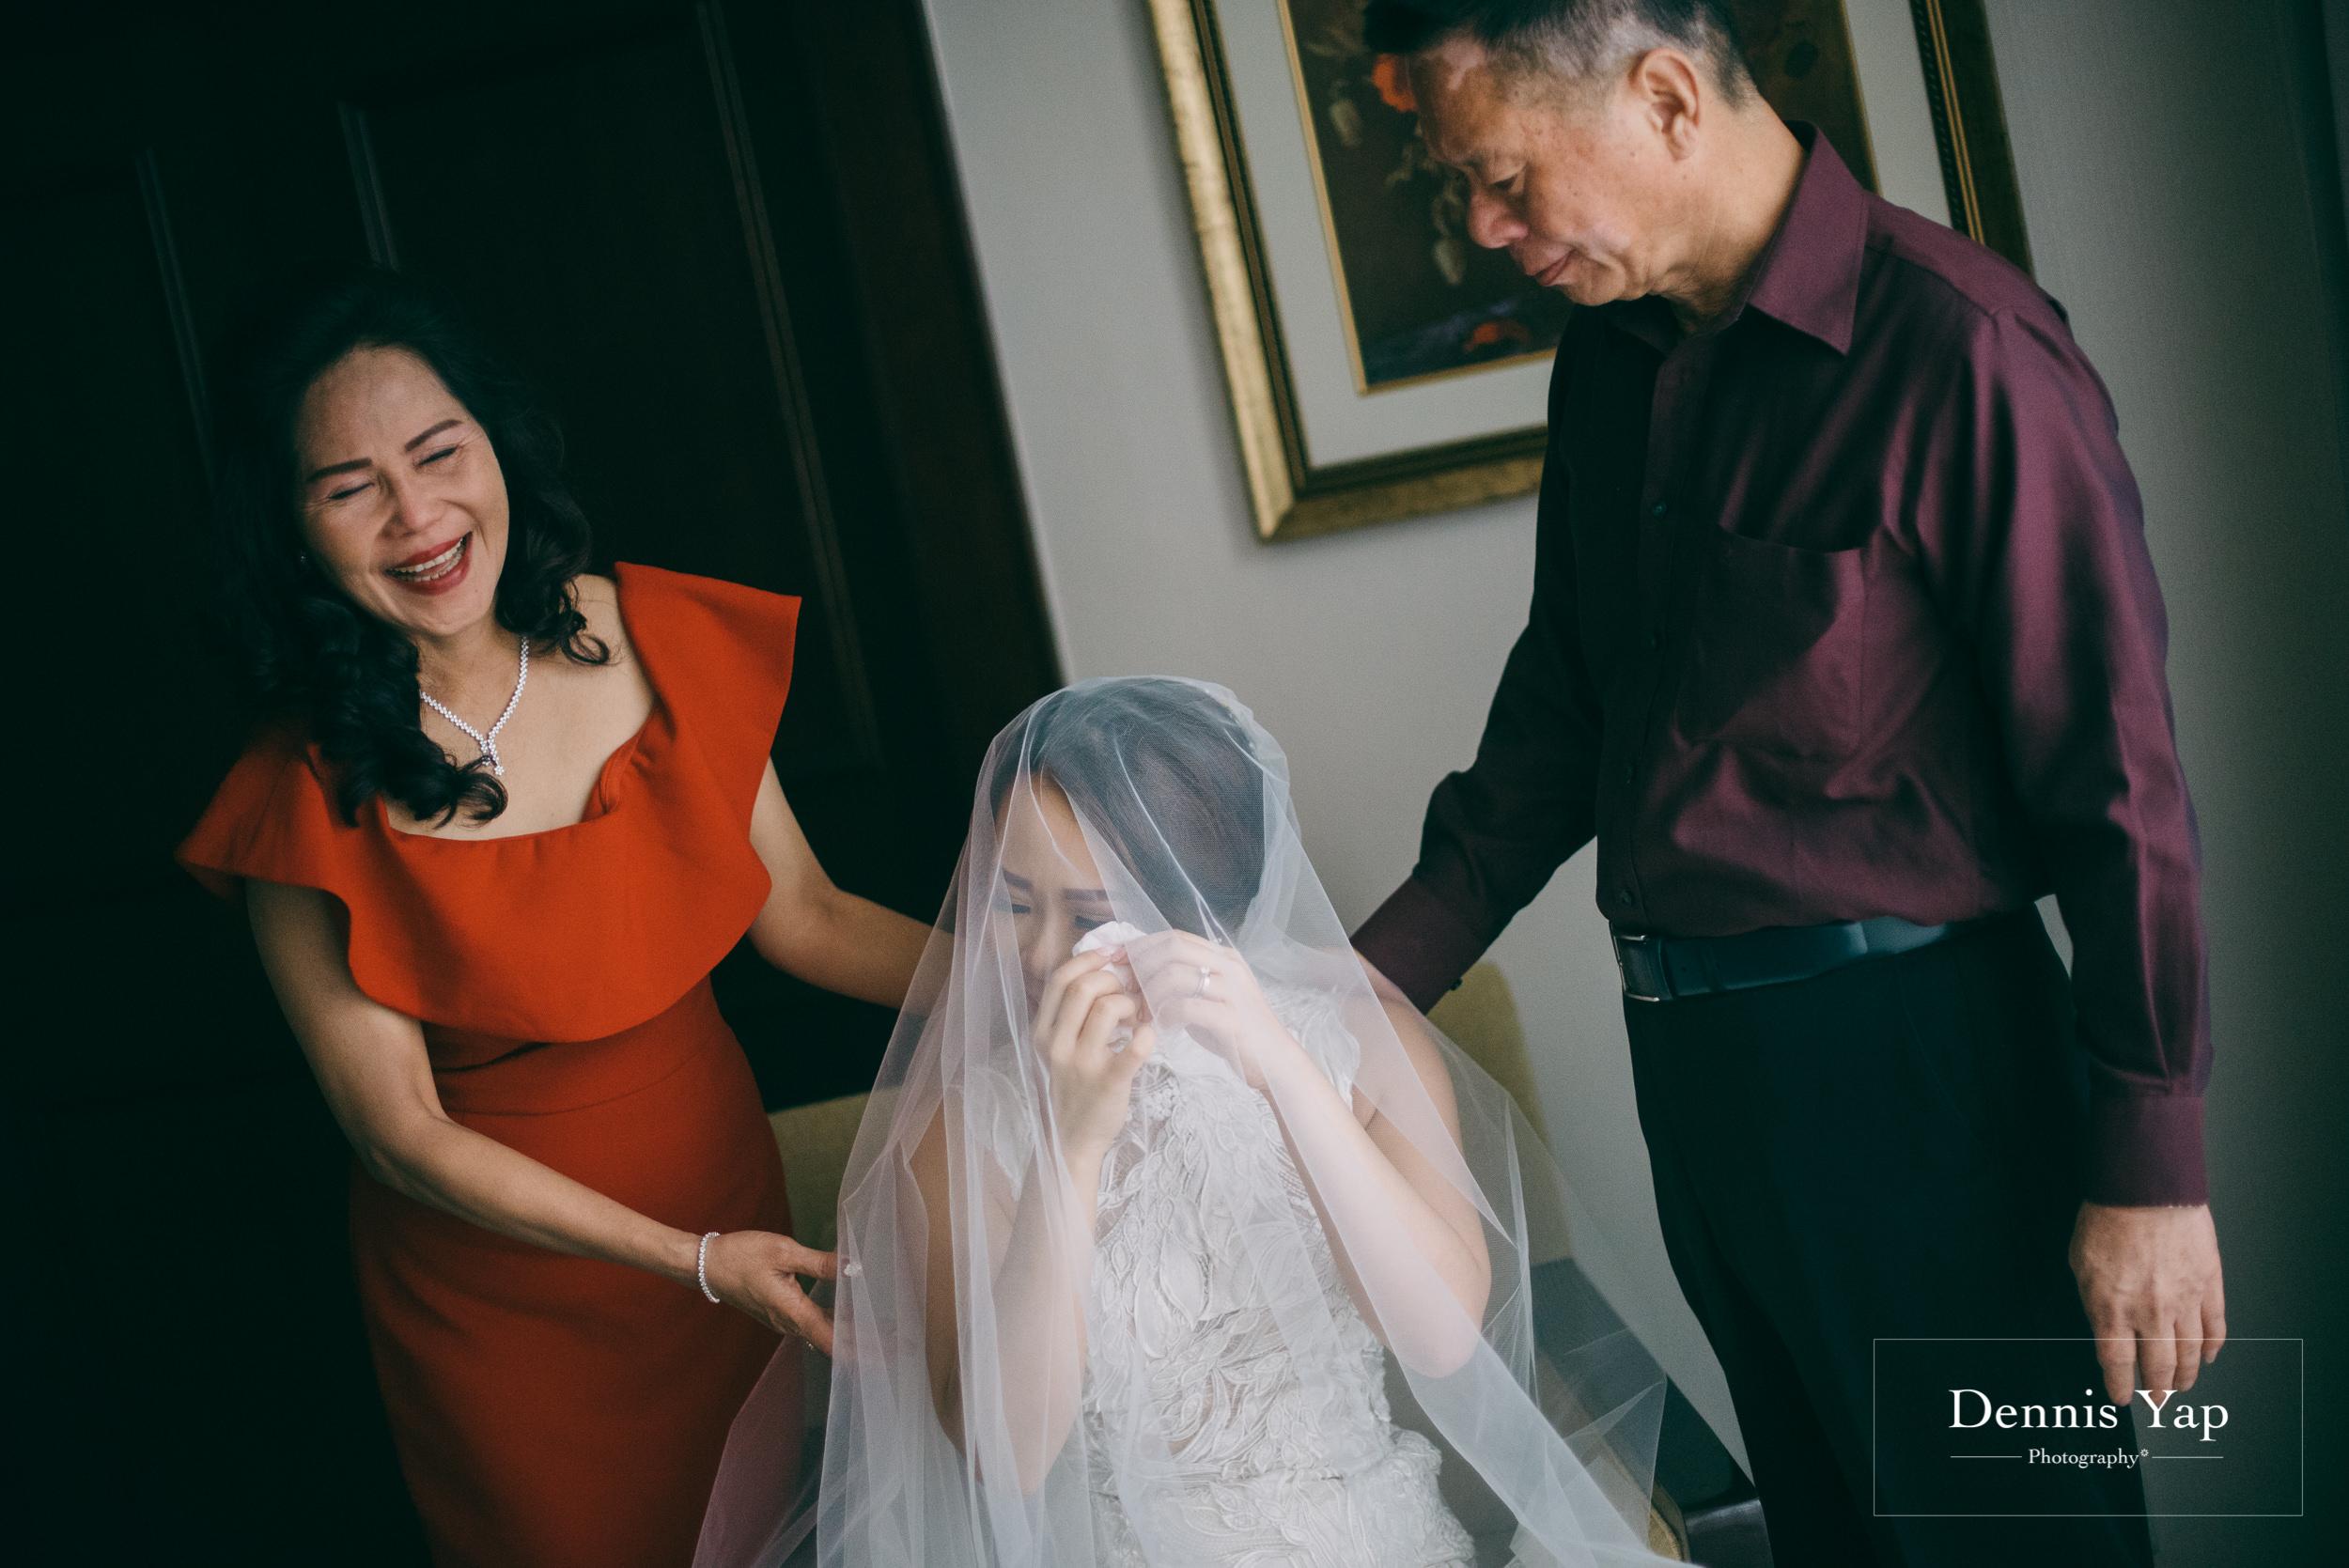 keat mandy wedding day marriot putrajaya dennis yap malaysia wedding photographer-12.jpg